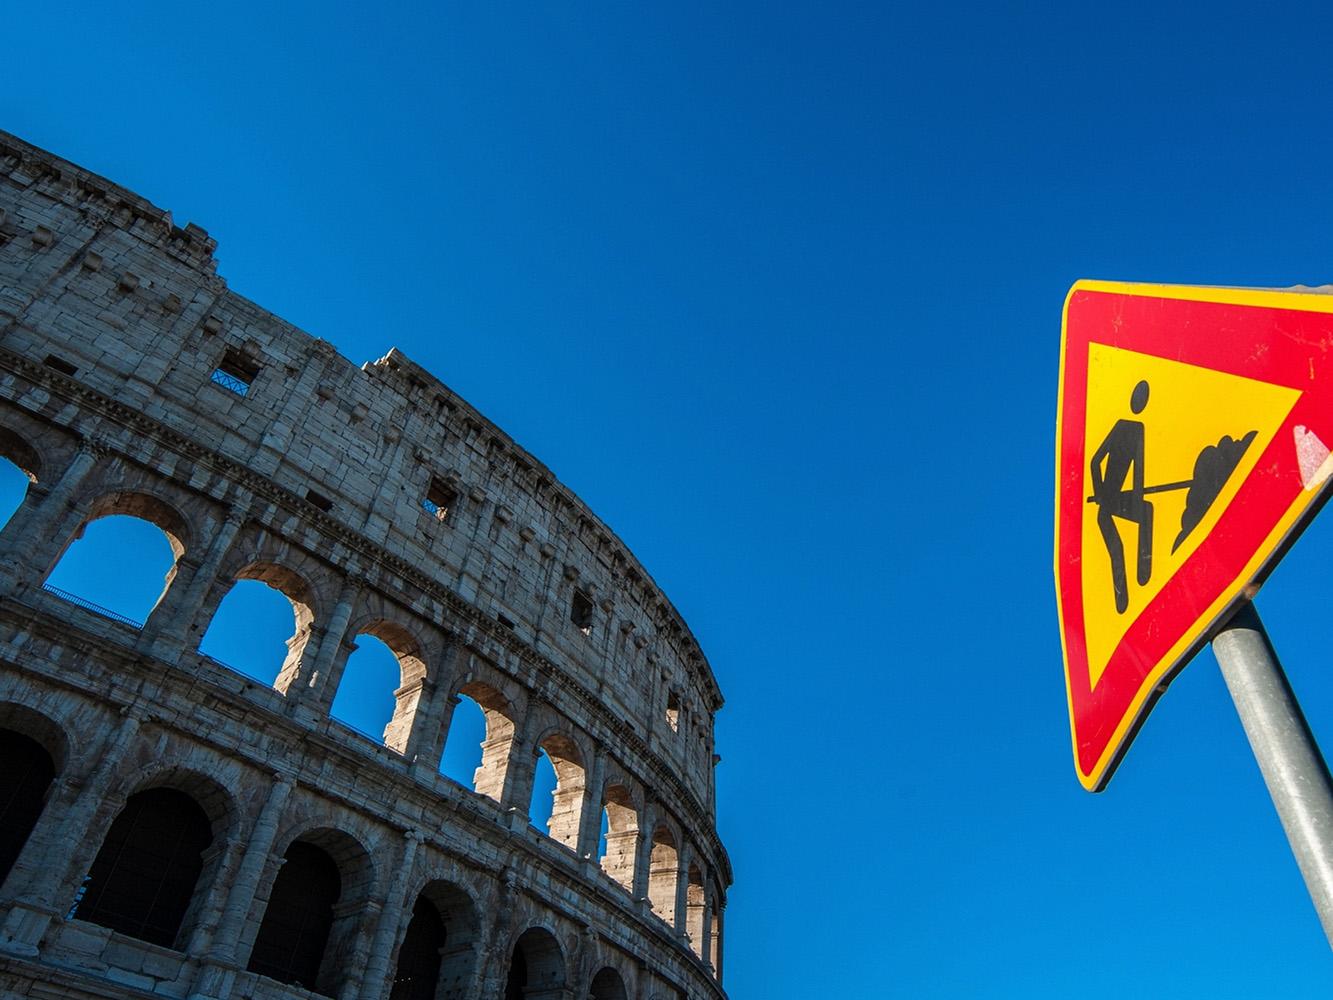 Open_Under Constraction in Rome_Trevor Templeman_ABgr_DPI_Honour